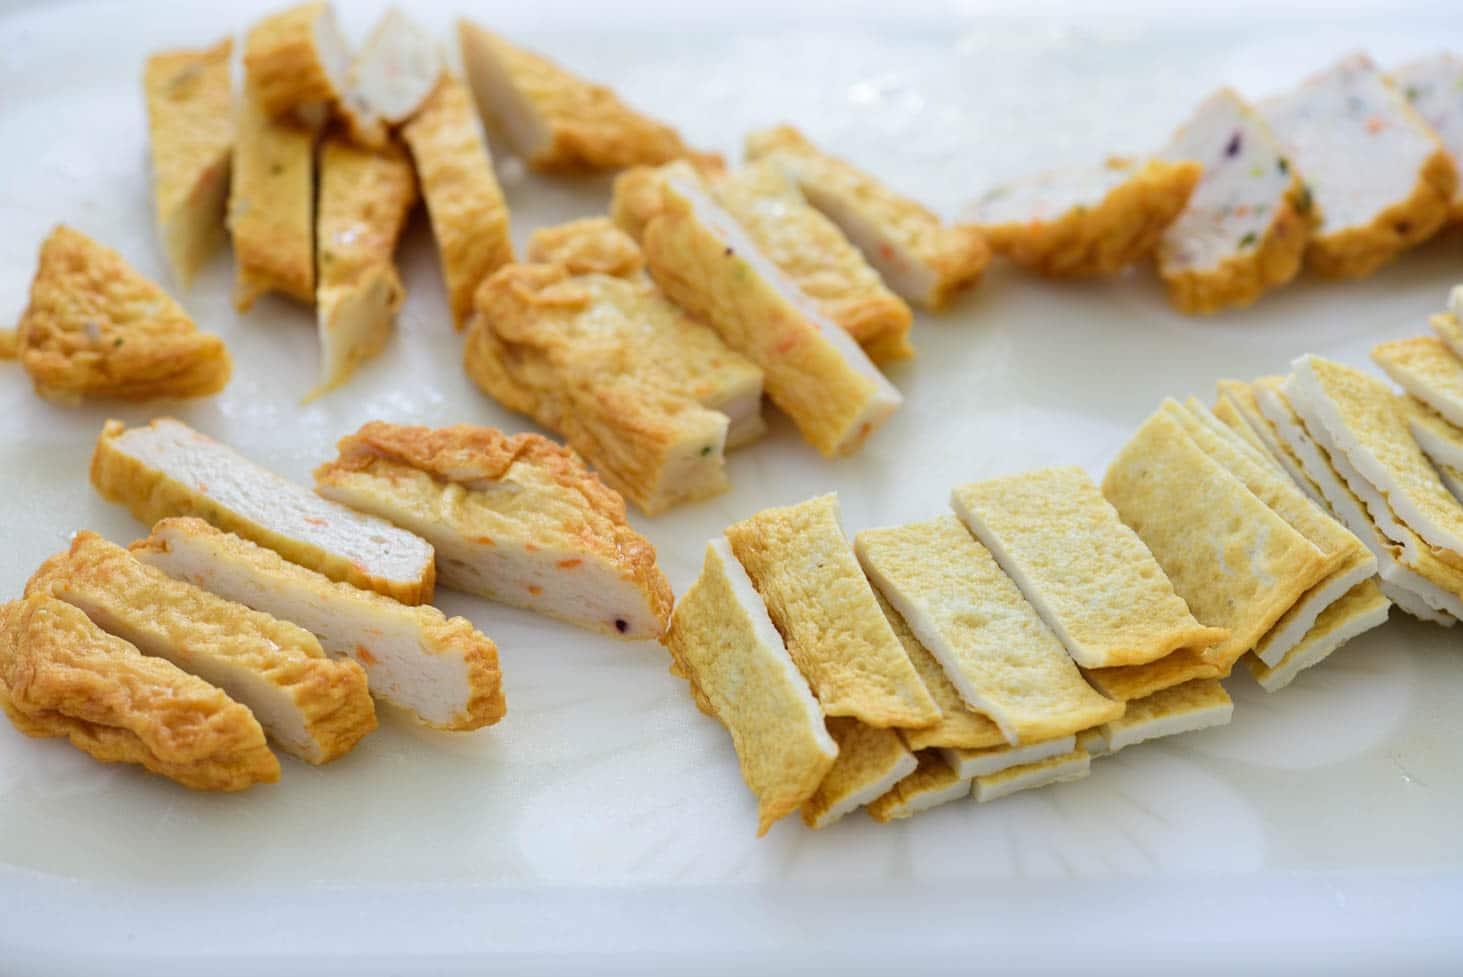 DSC9775 01 2 - Eomuk Bokkeum (Stir-fried Fish Cake)